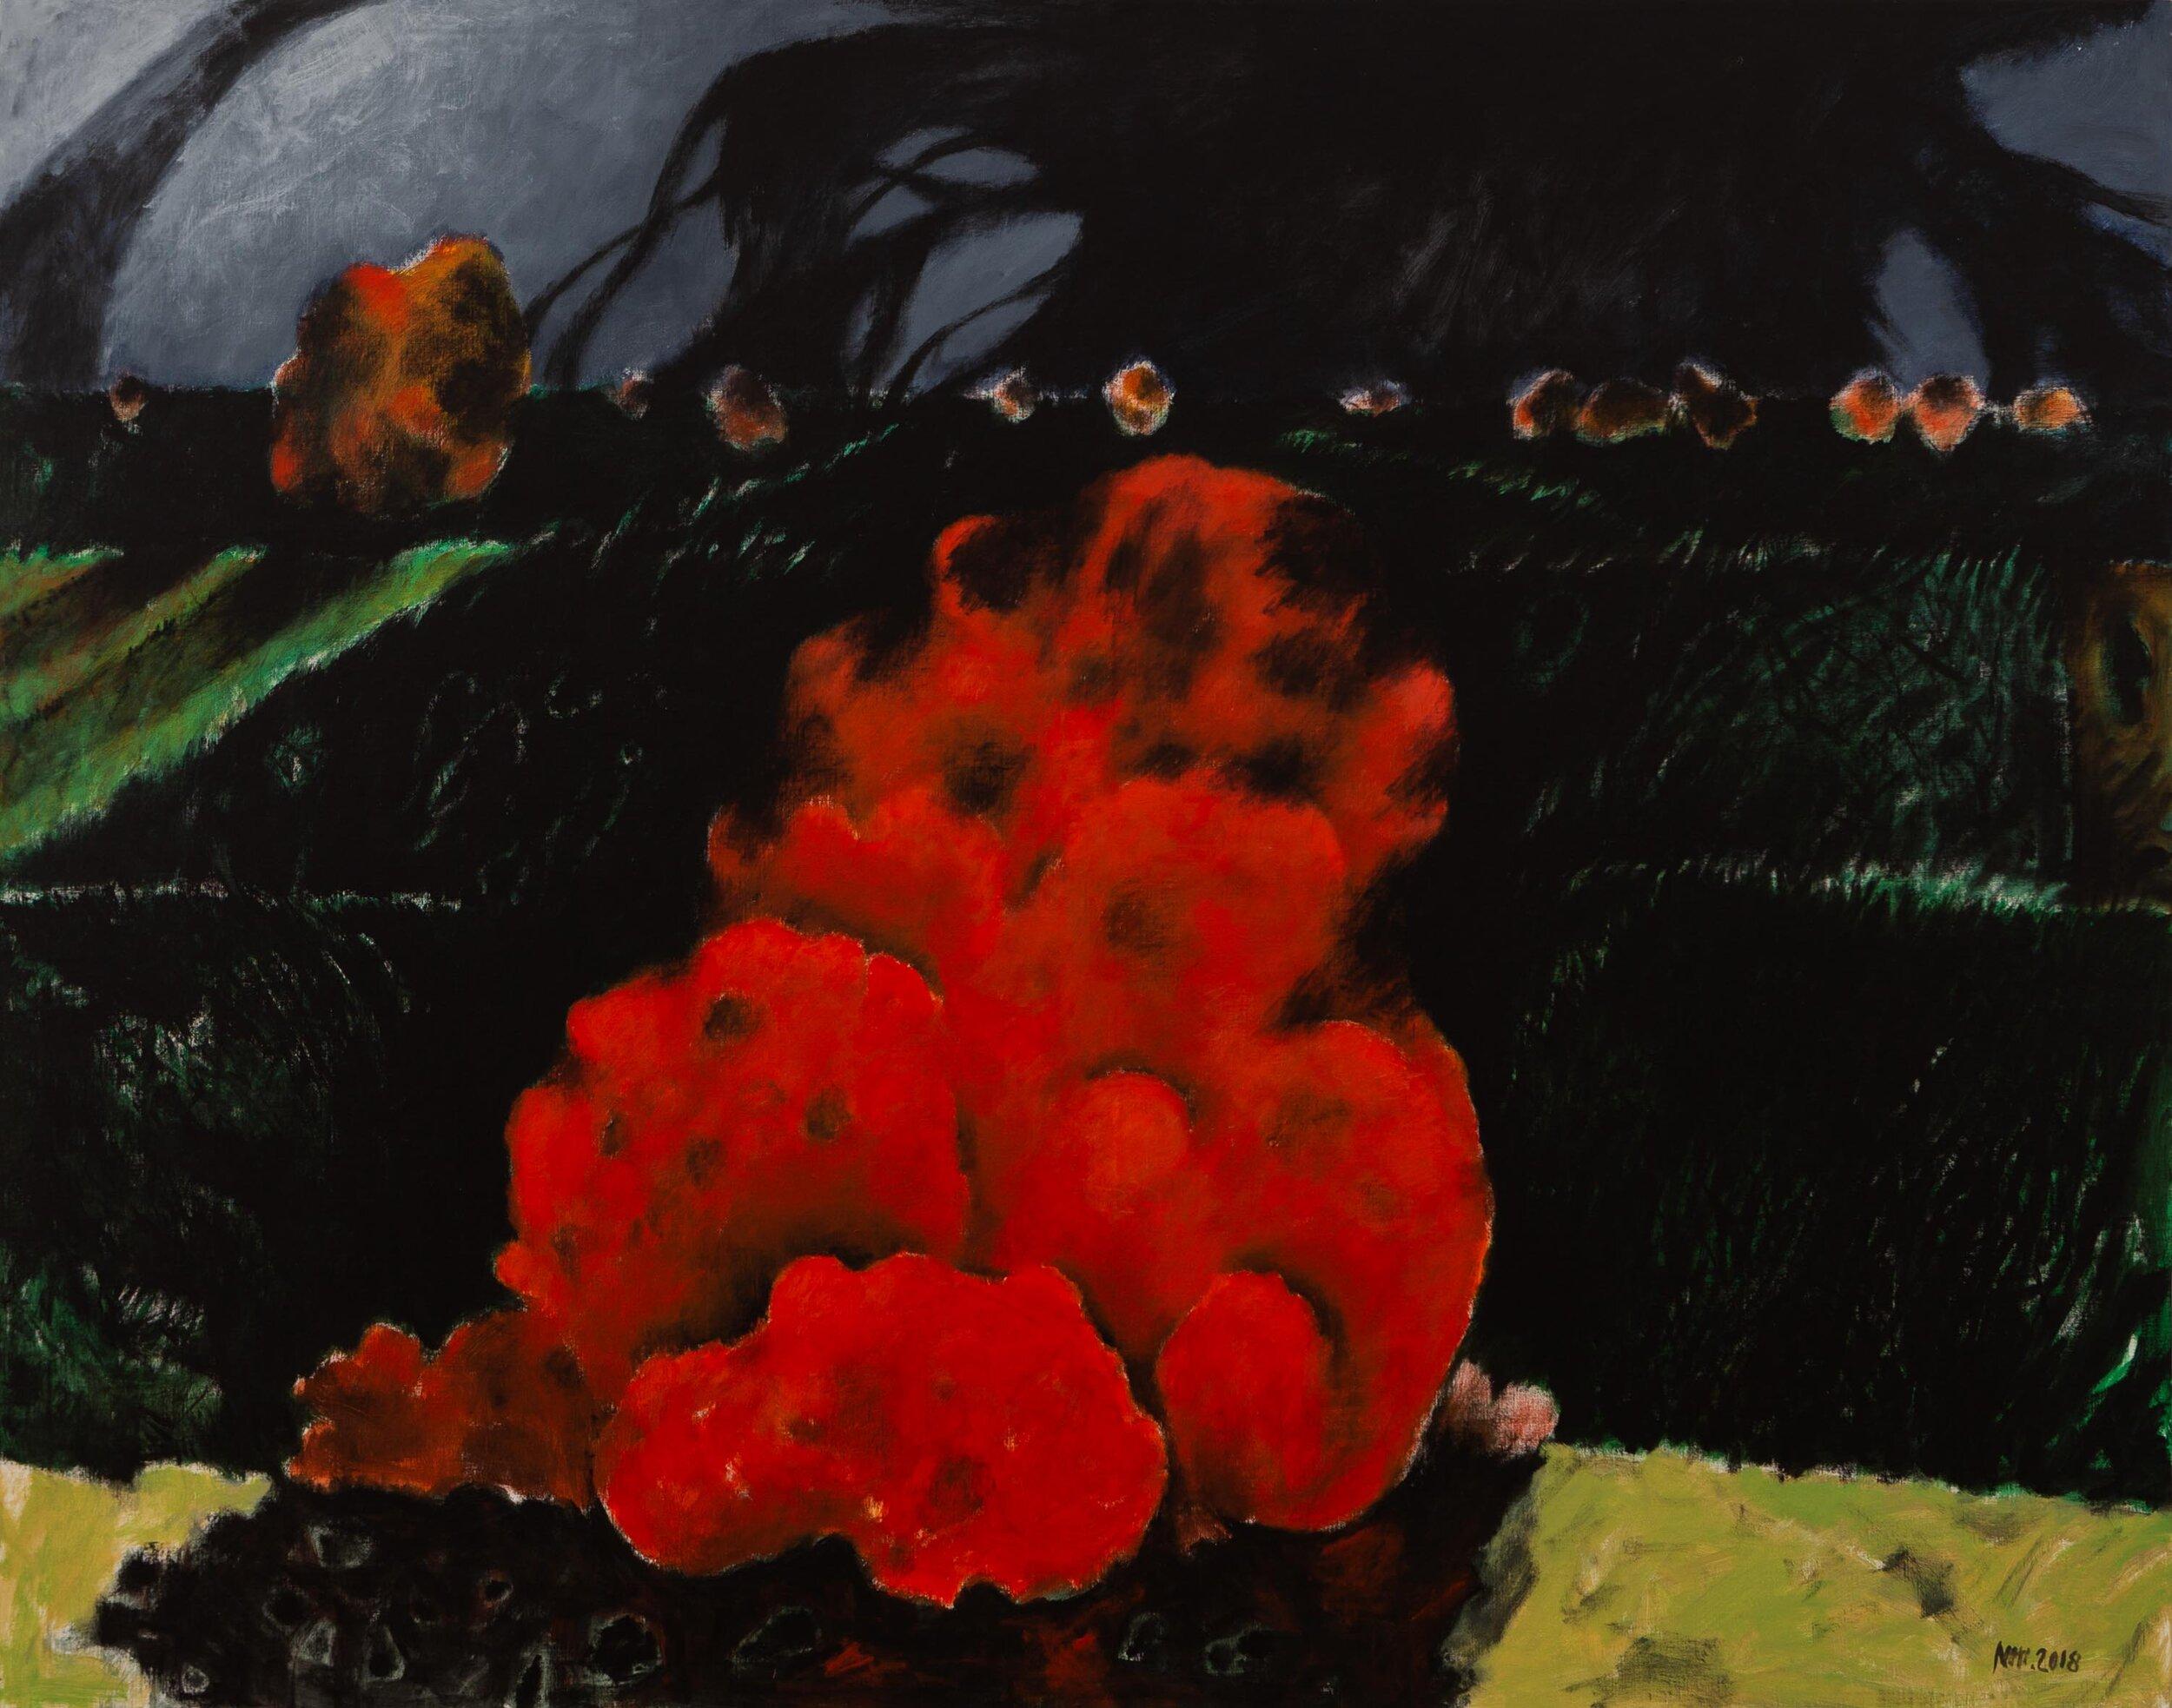 Niti Wattuya, 'Cadmium Red', 2018, acrylic on canvas, 144.5 x 184.7cm. Photograph by Krisada Suvichakornpong.